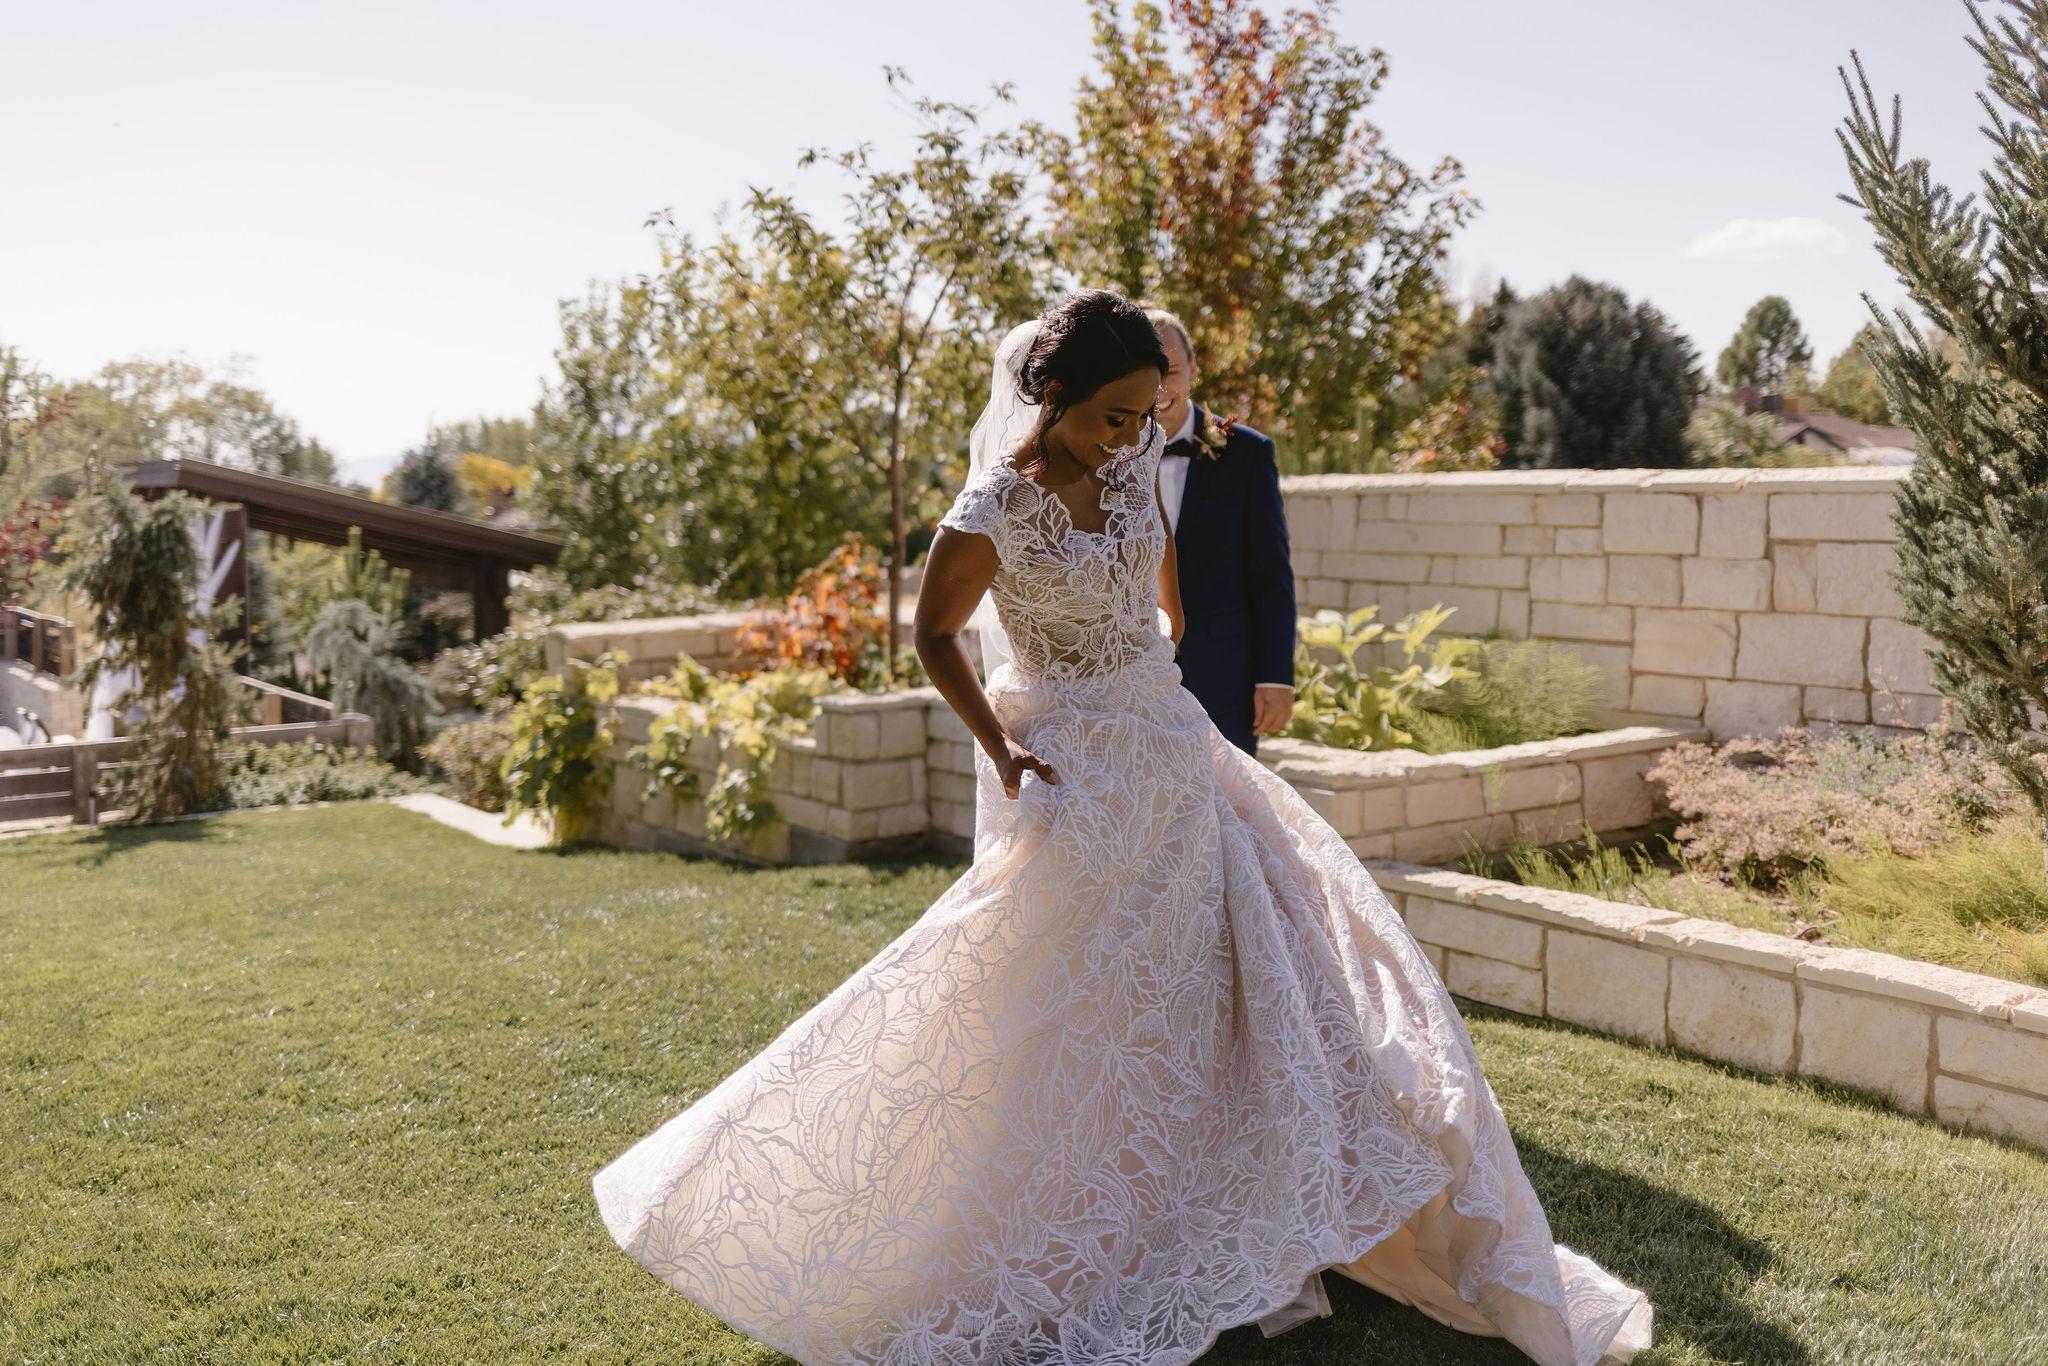 Modest Lace Wedding Dress Ballgown Backyard Summer Wedding Princess Kaiulani Tabernero 4